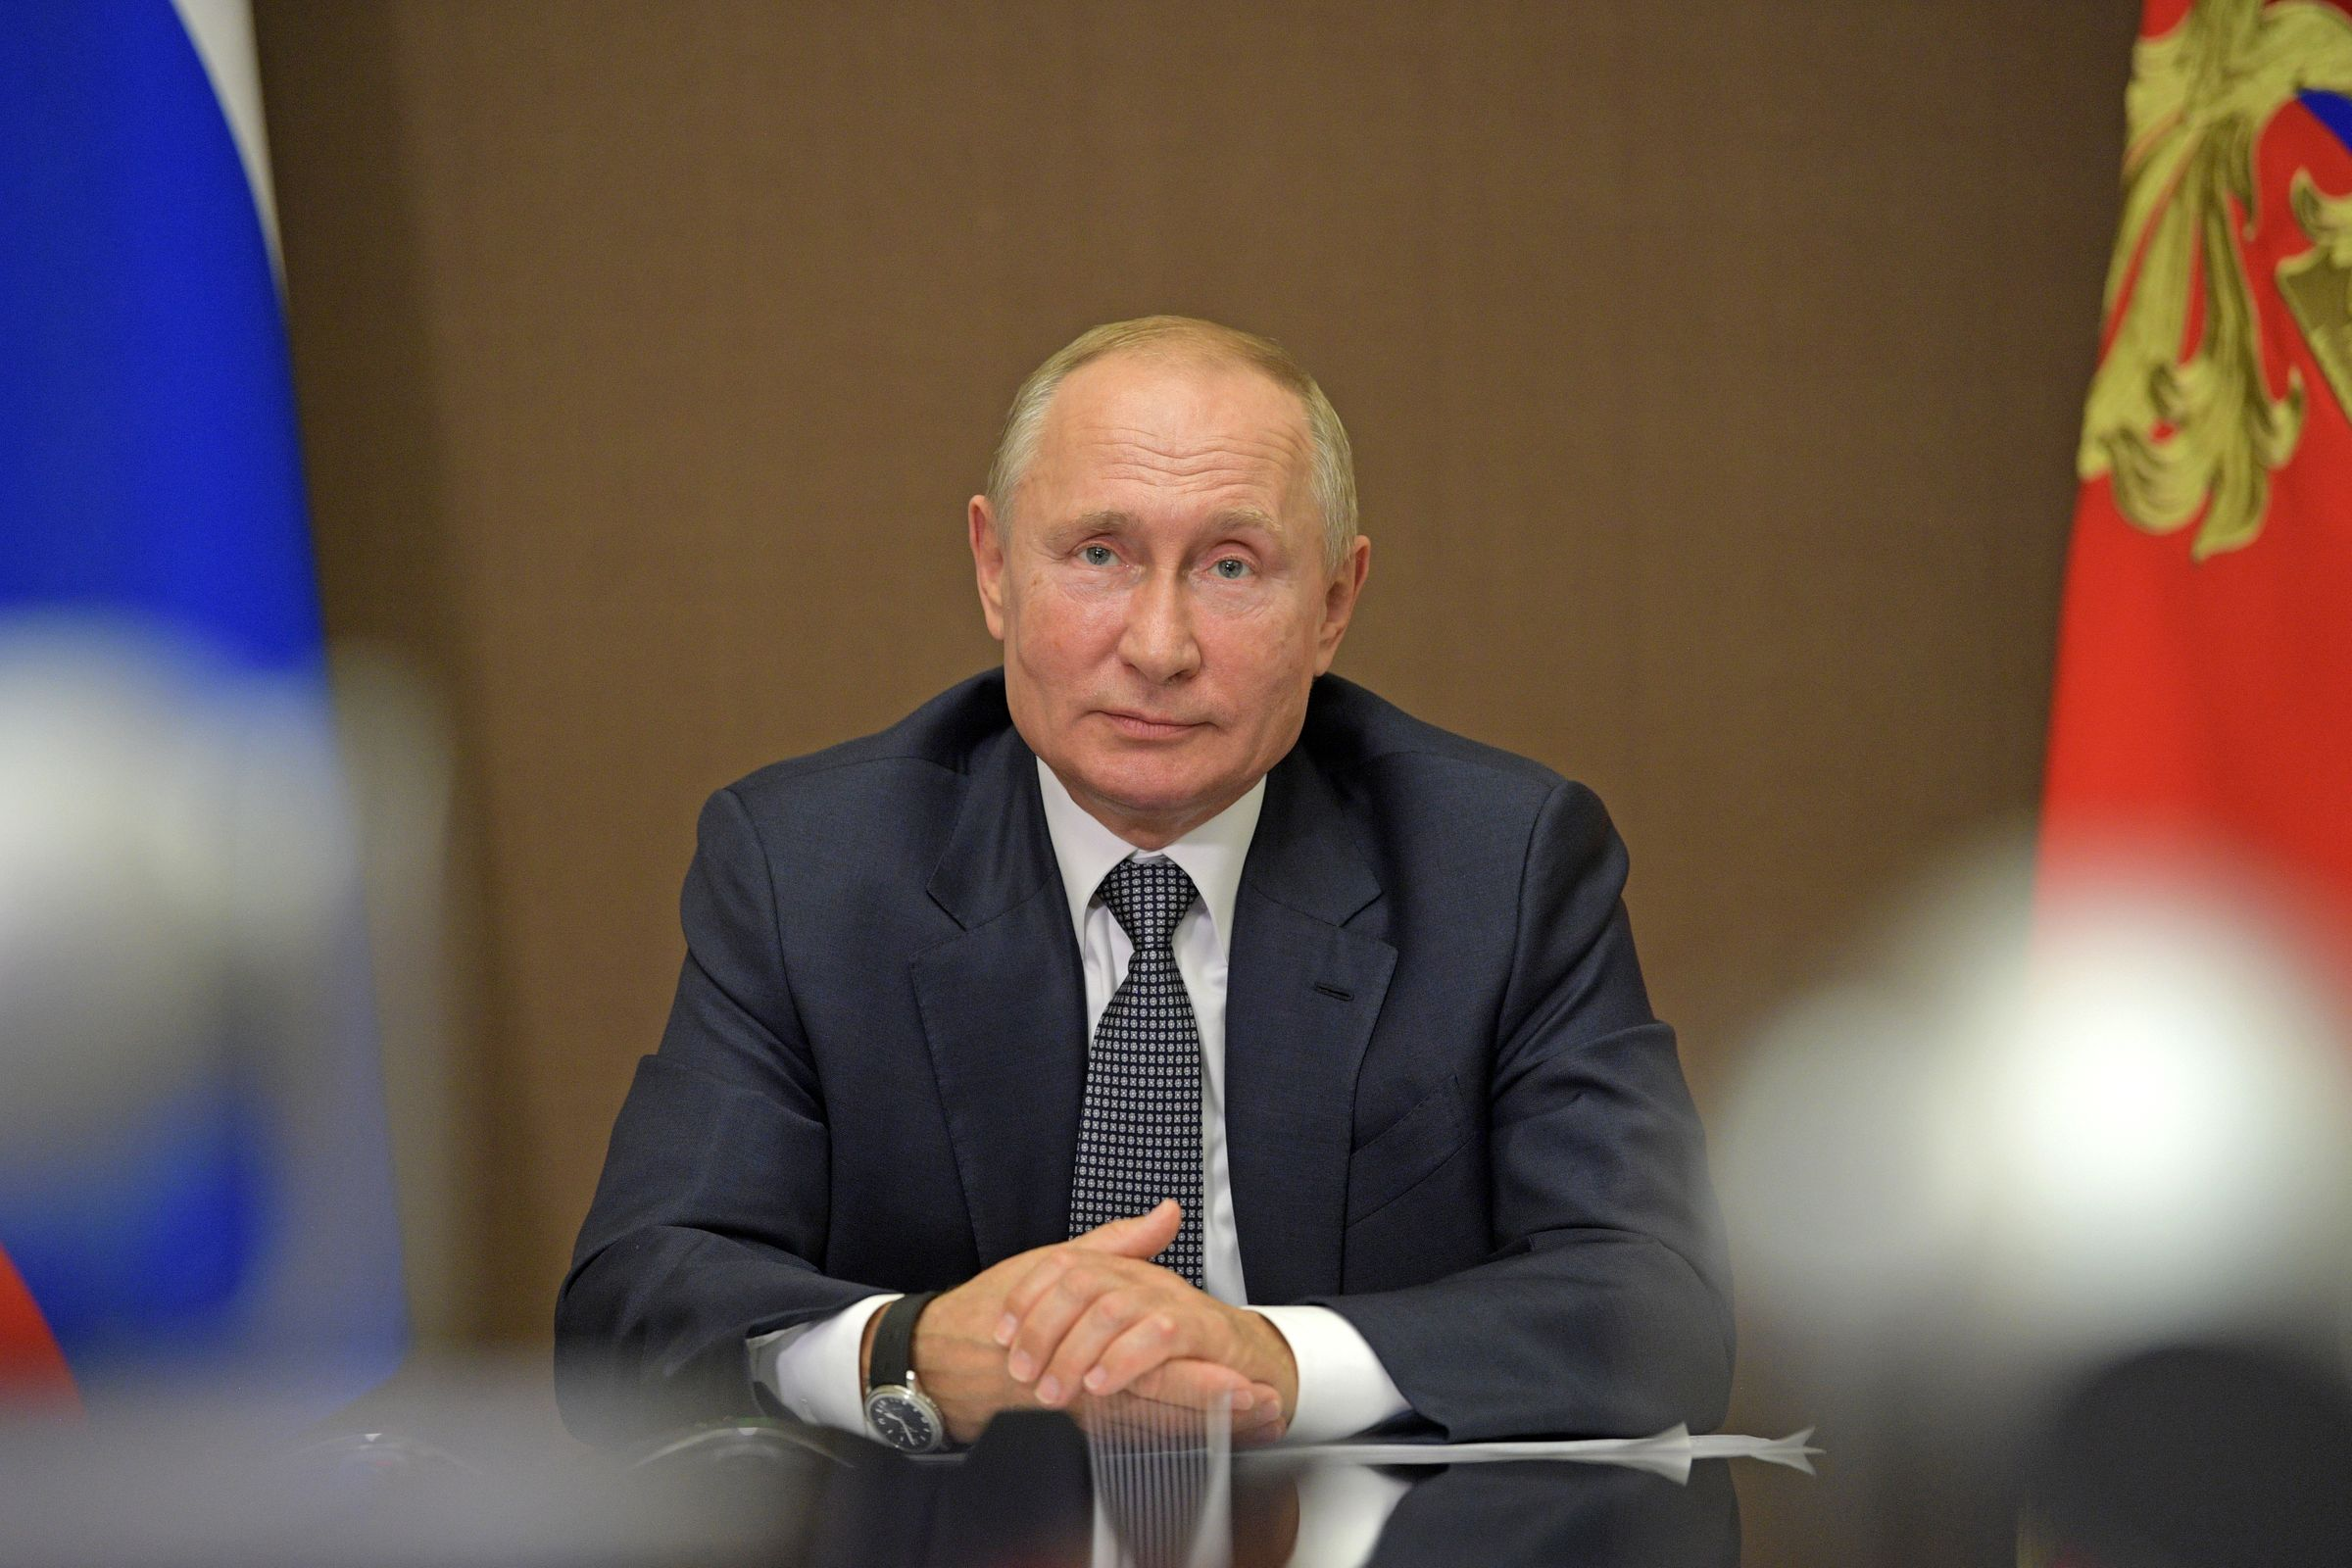 <p> Фото © Пресс-служба президента РФ/ТАСС</p>